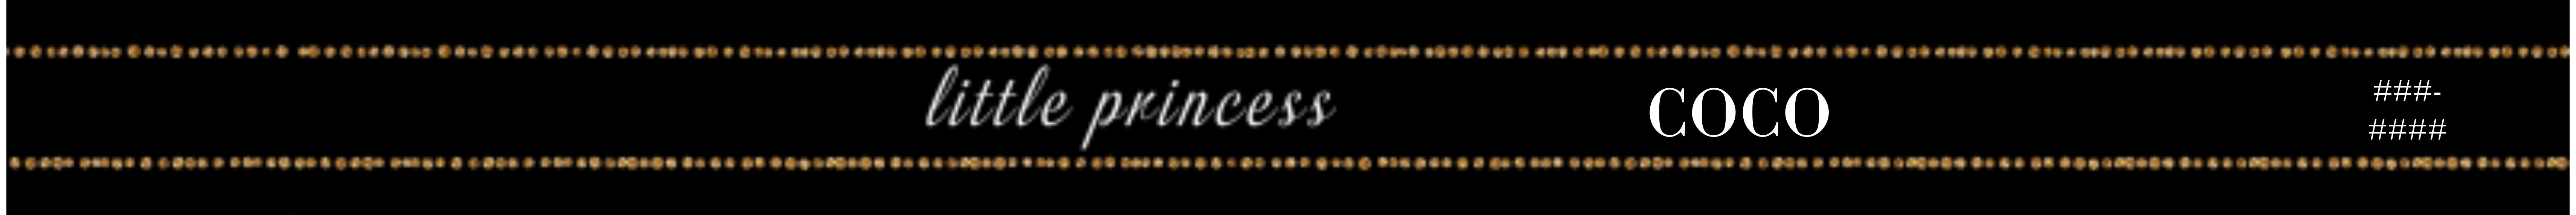 Miscellaneous Small Pet Collar, Gift -Pretty Princess Pet Black